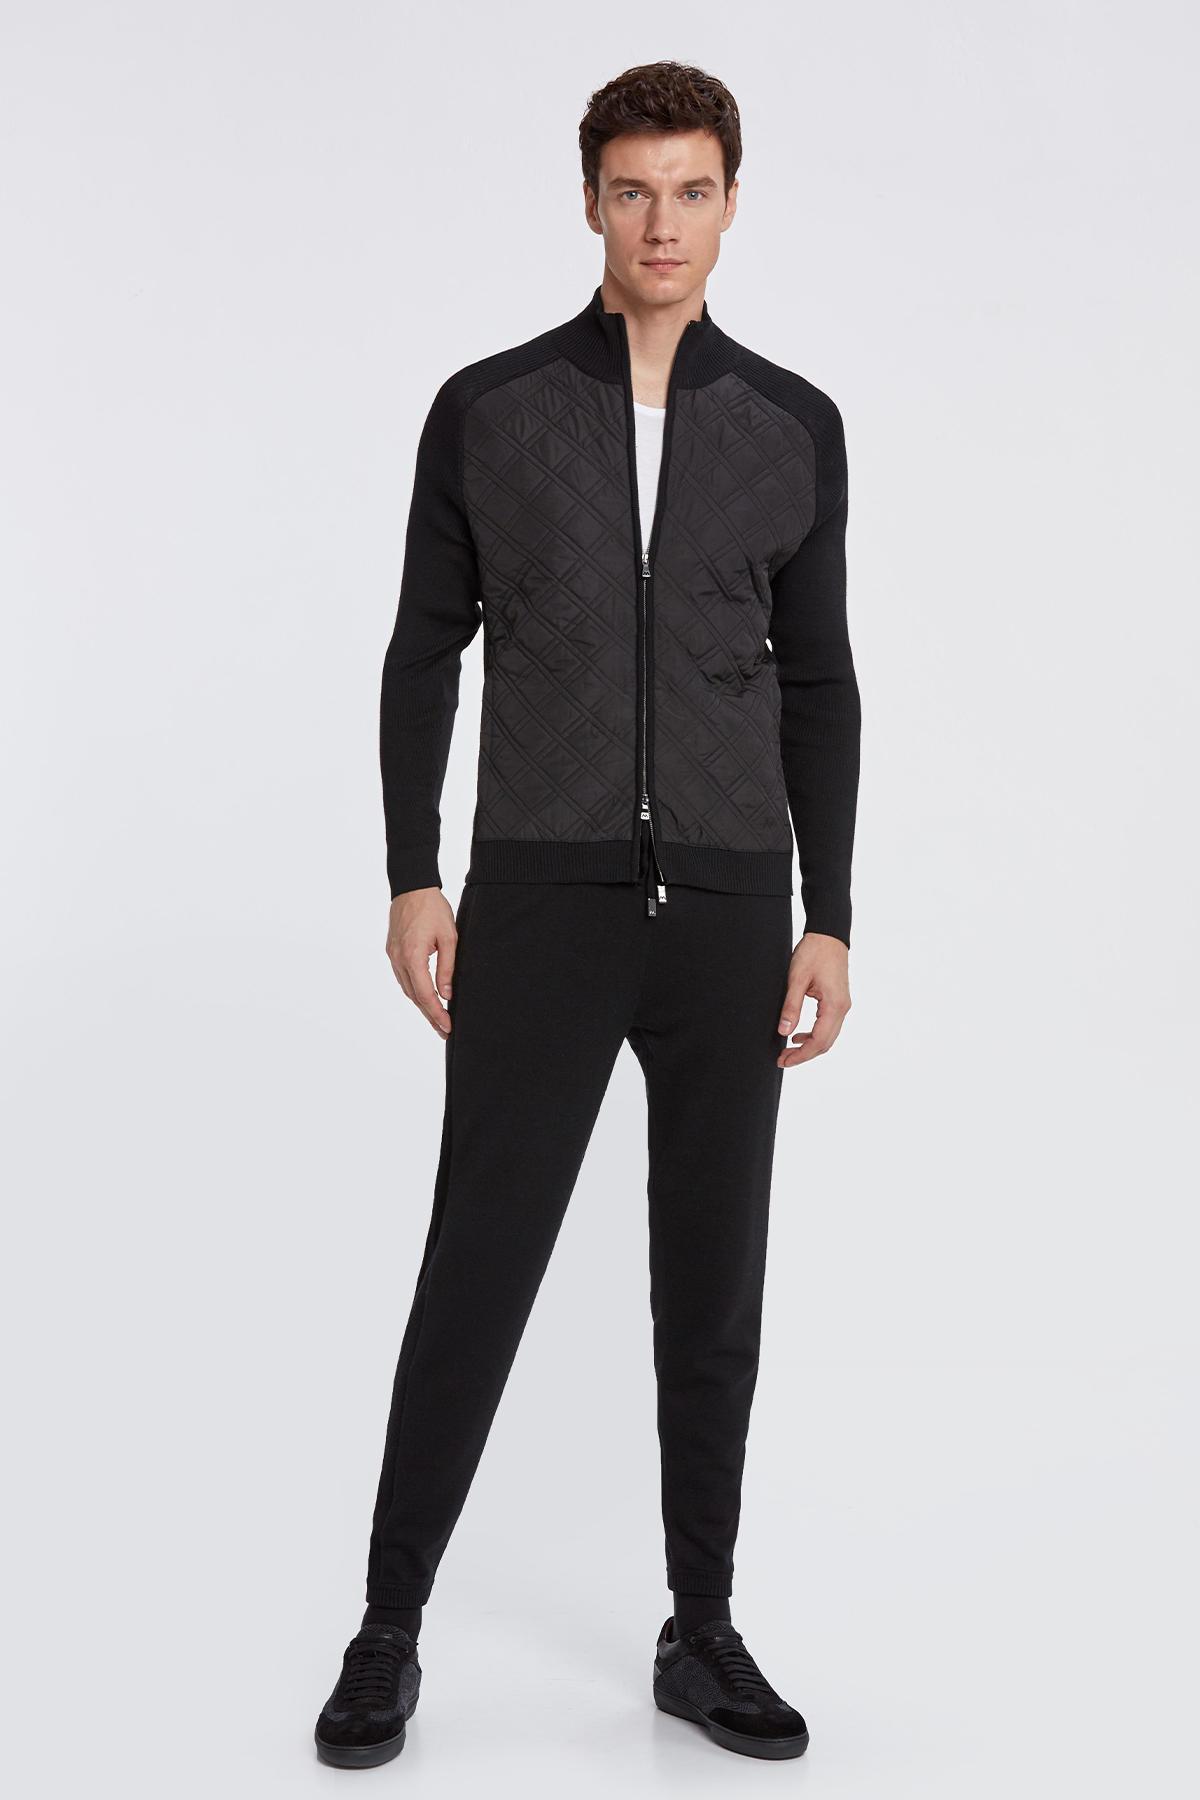 Merino Yün Desenli Siyah Activewear Triko Mont